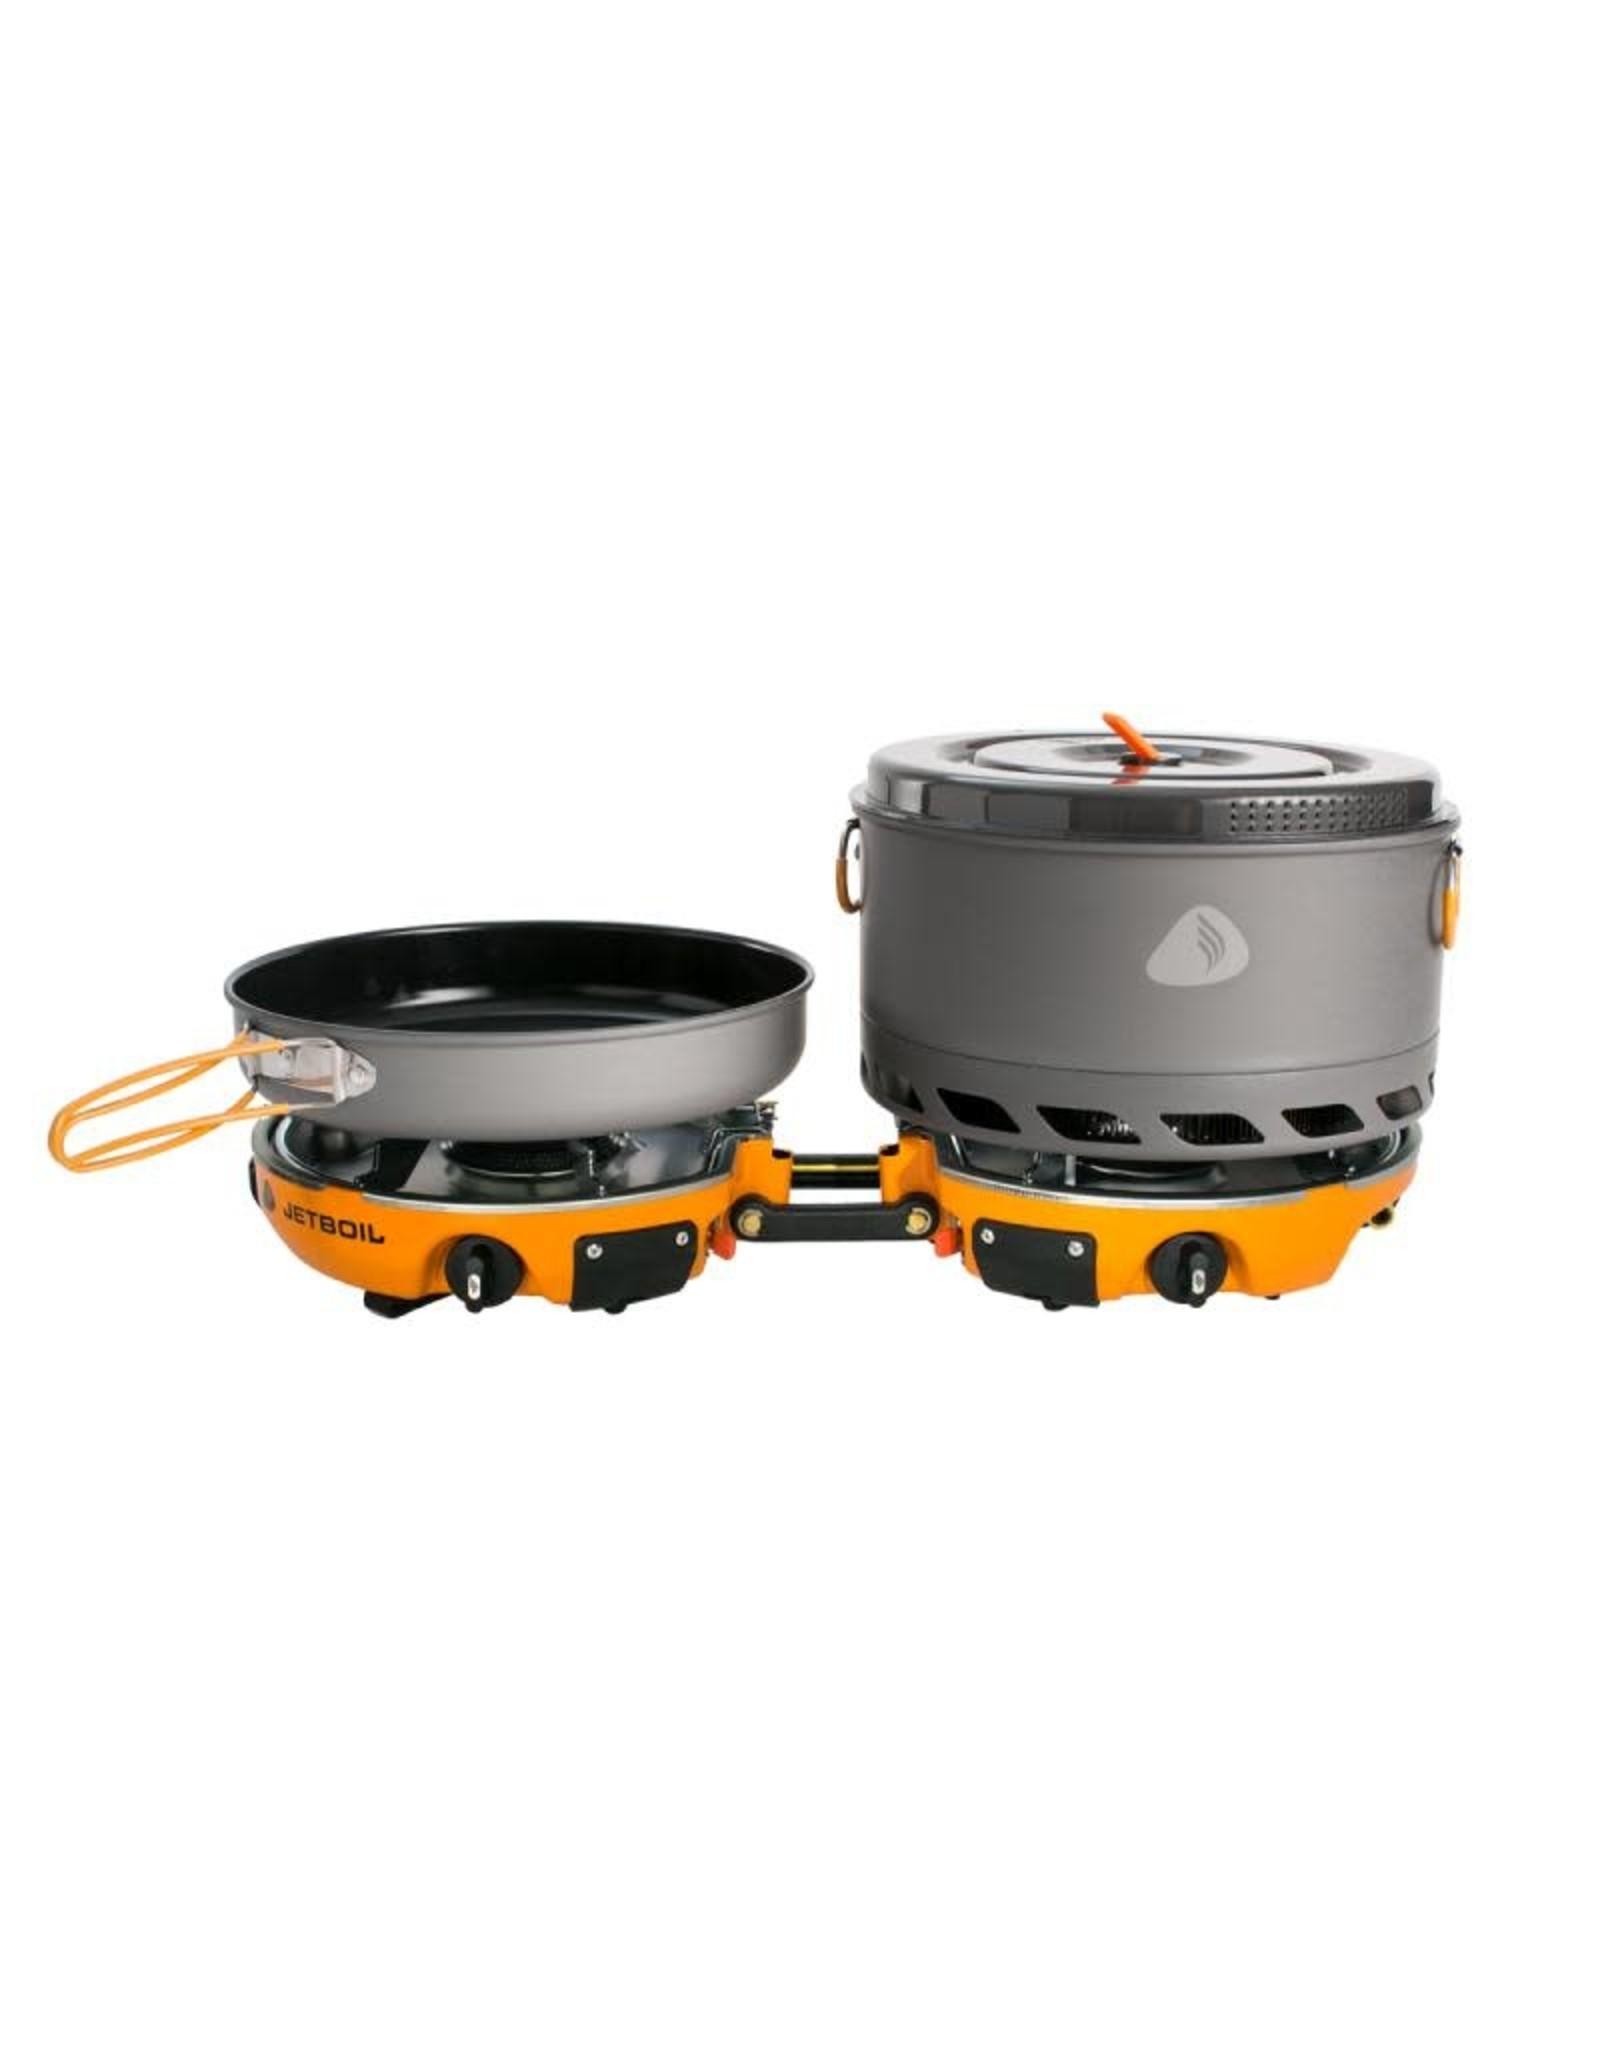 Jetboil Genesis Cooking System